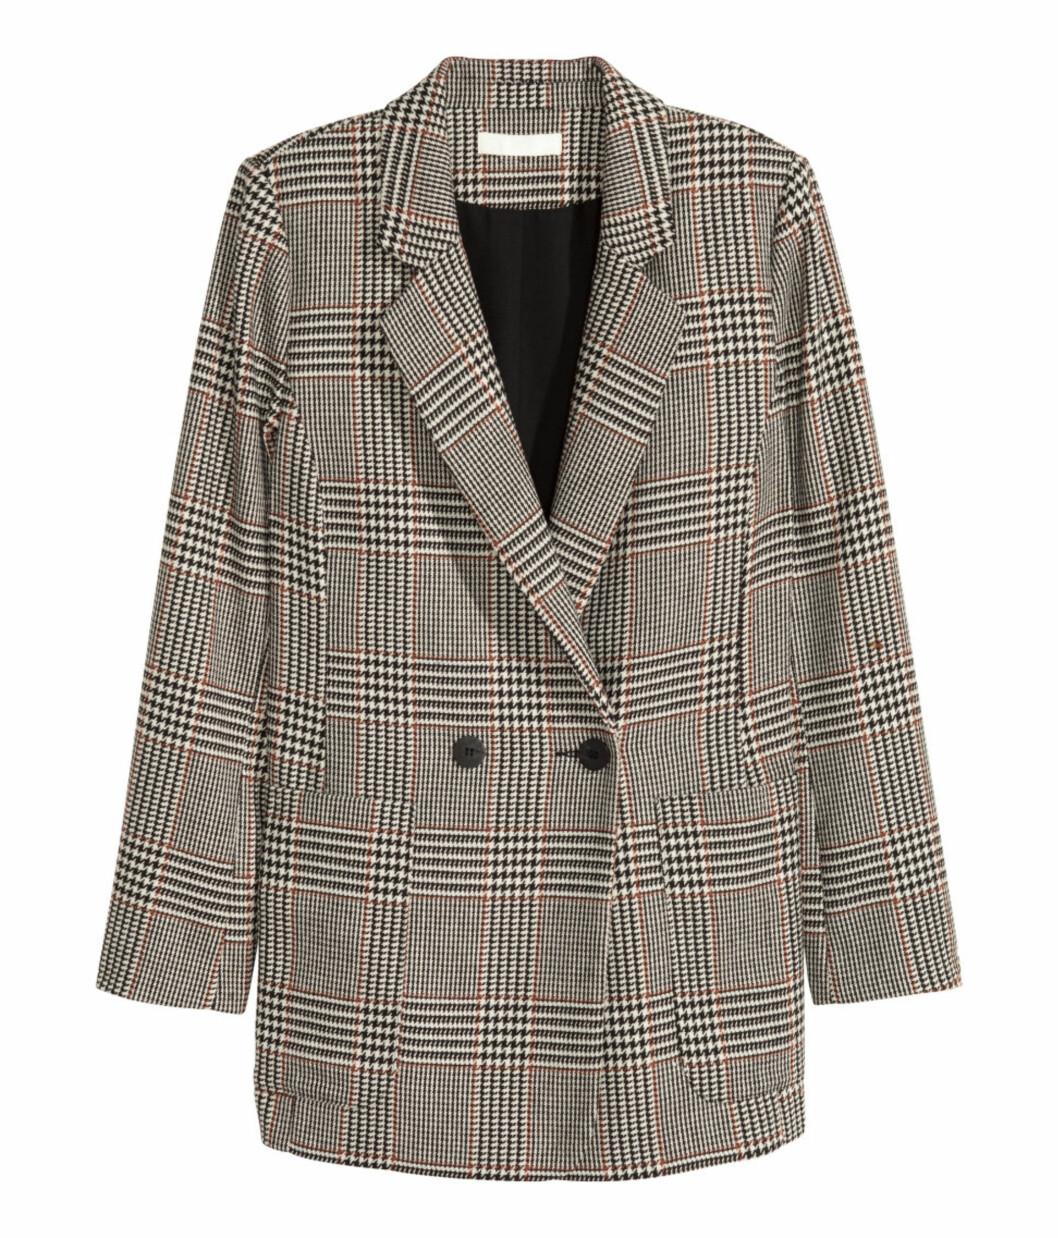 Rutete blazer fra H&M | kr 499 | http://www.hm.com/no/product/55297?article=55297-A